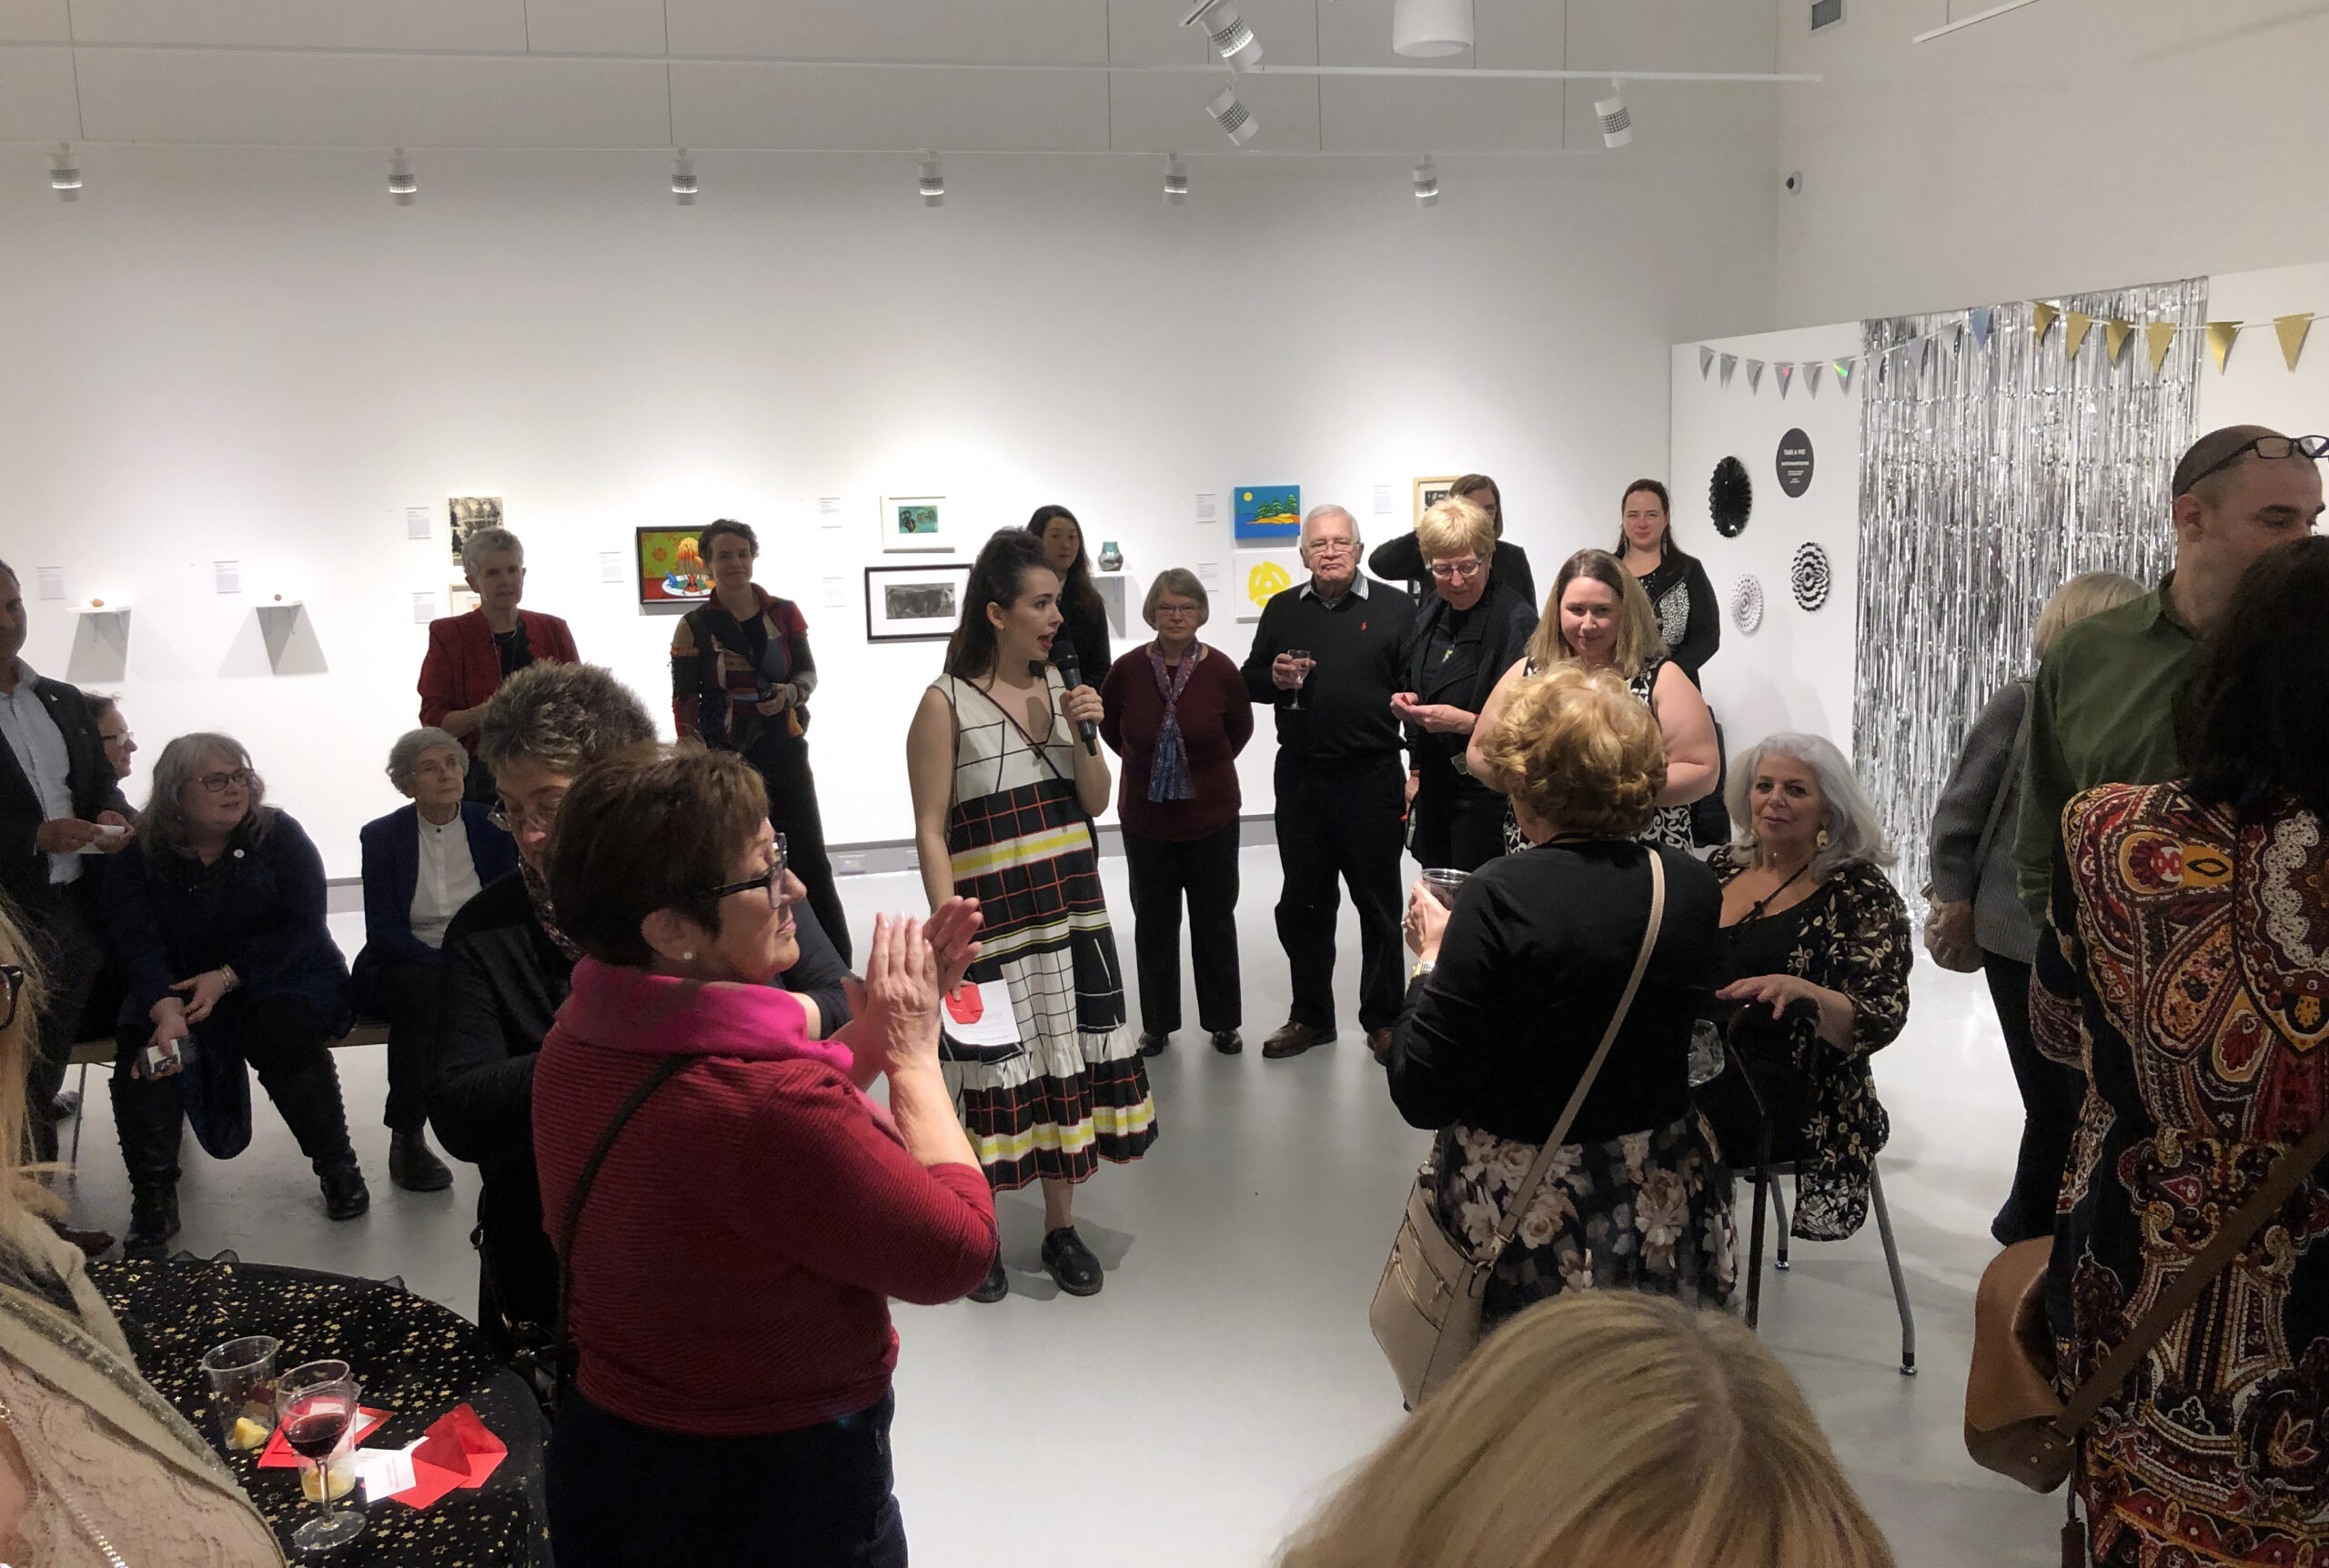 Art gallery gathering